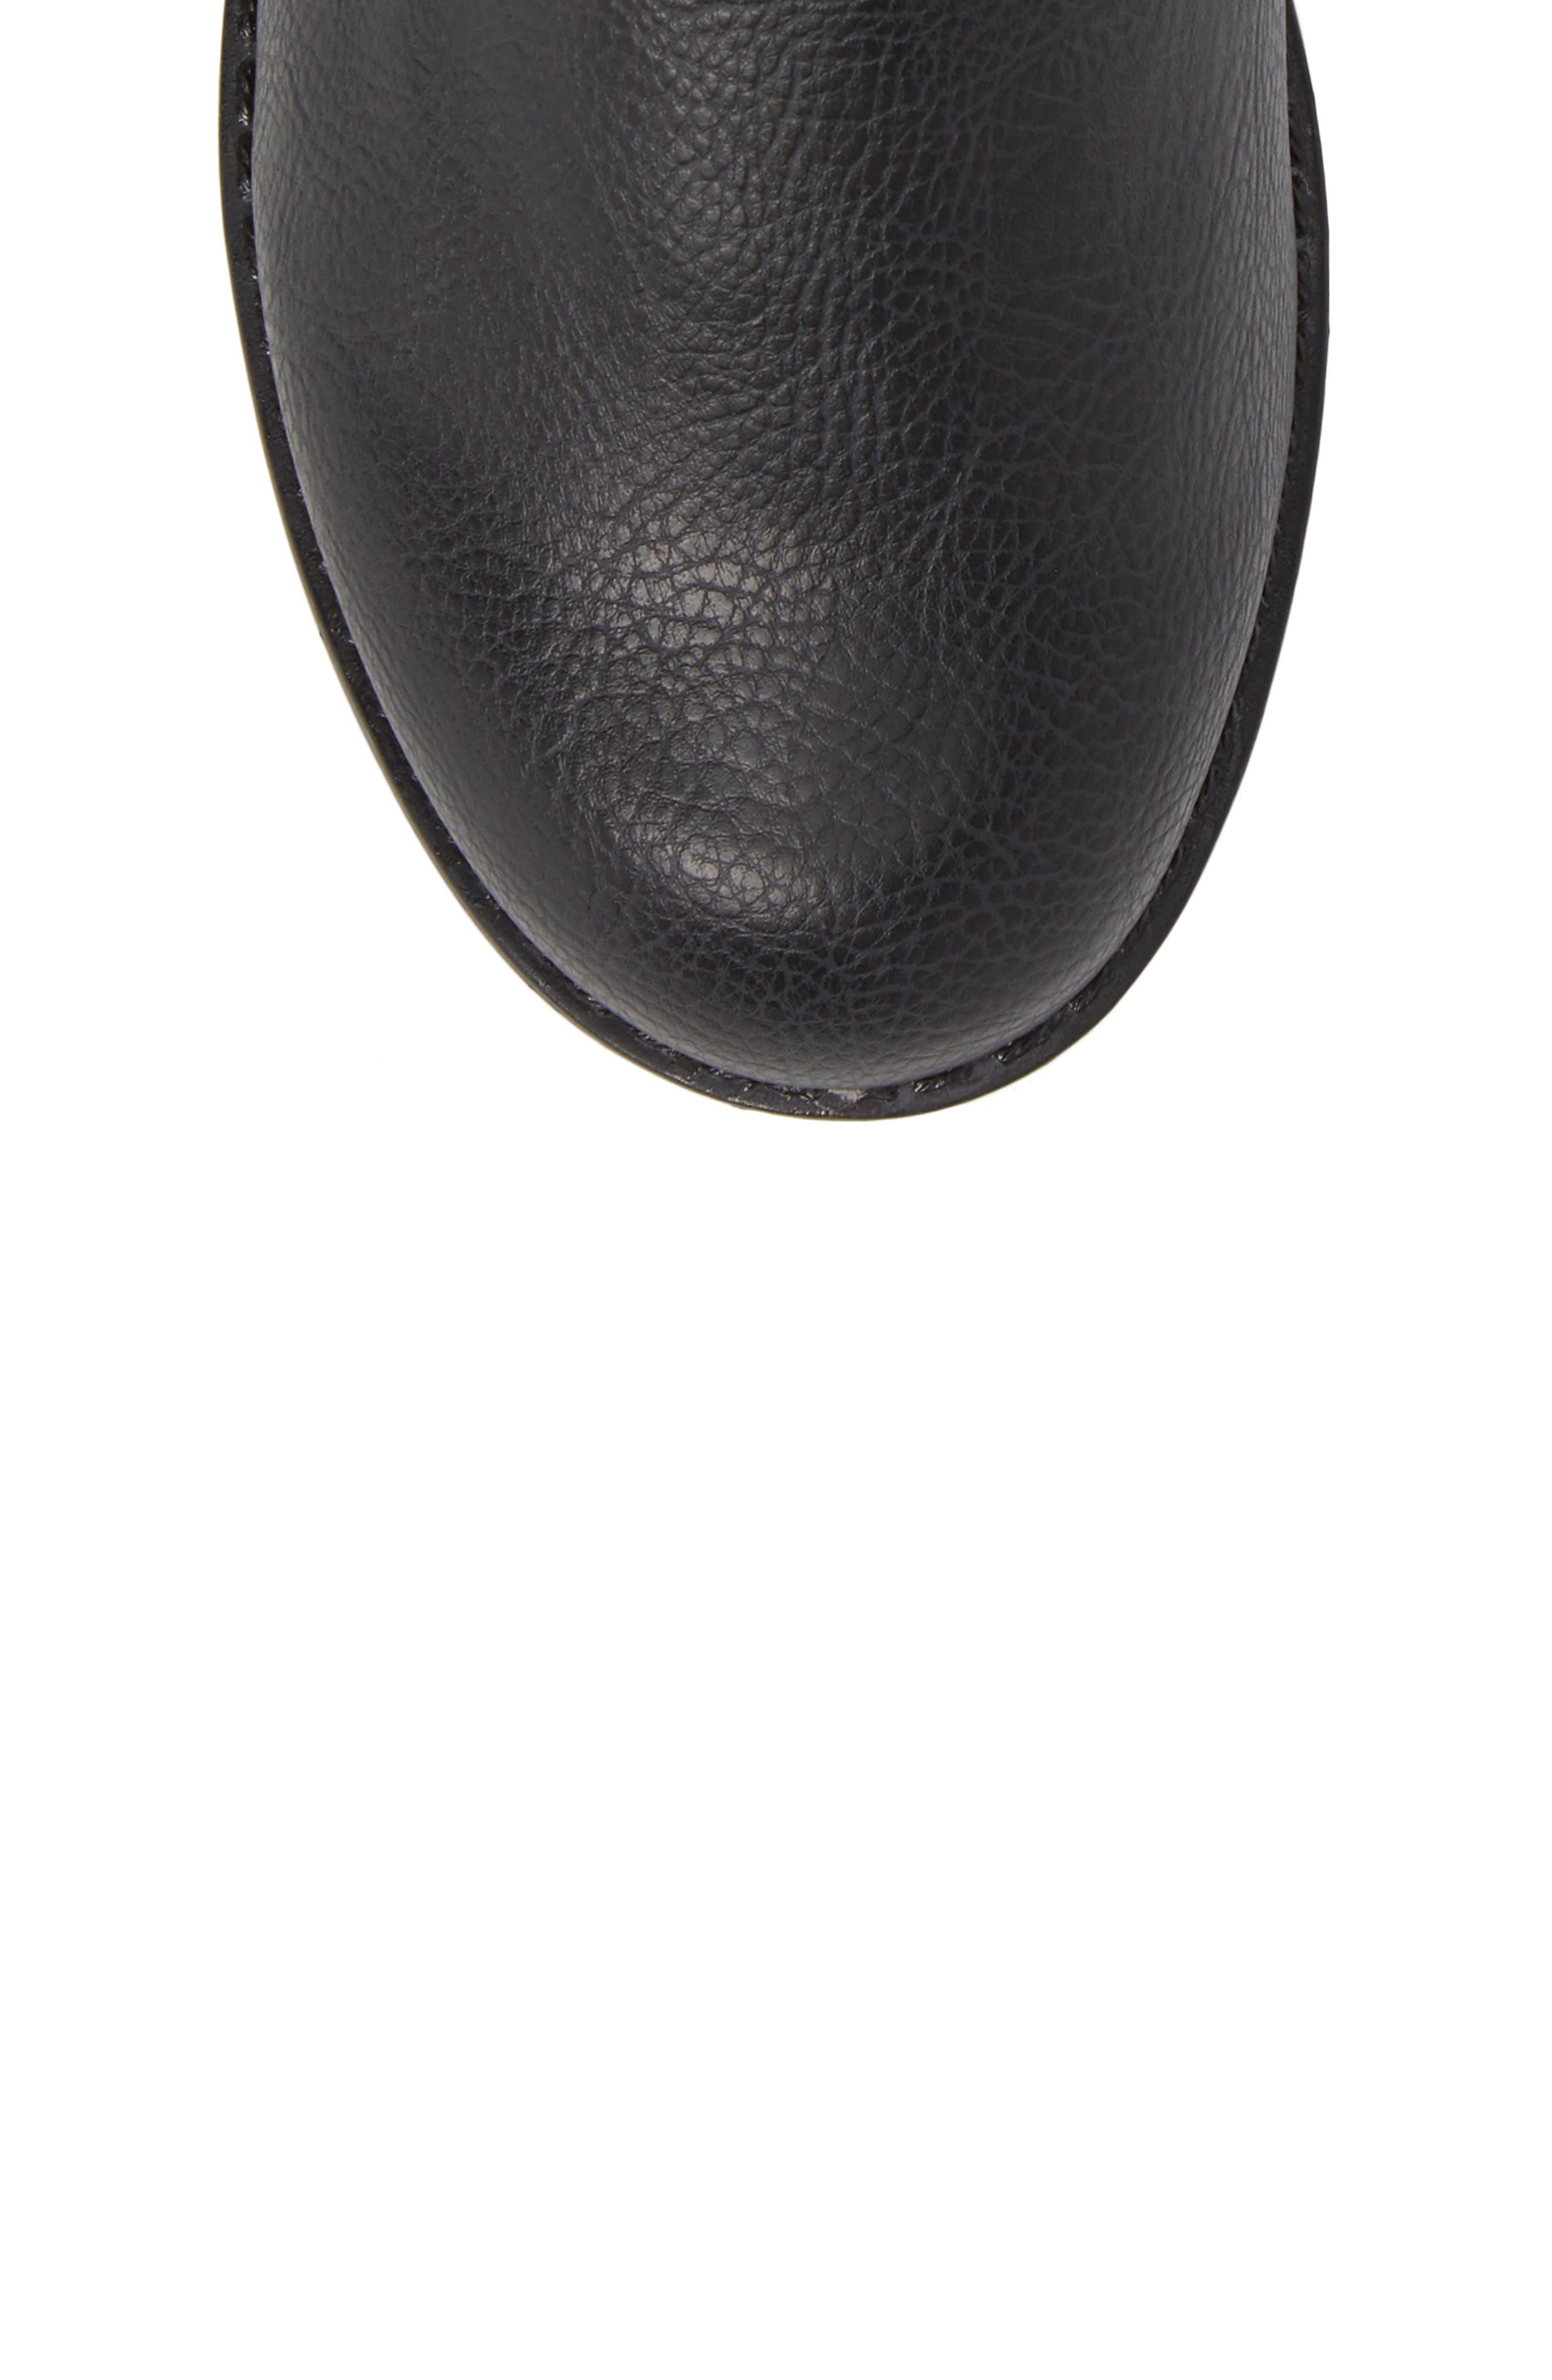 Autumn Stretch Boot,                             Alternate thumbnail 5, color,                             Black Faux Leather